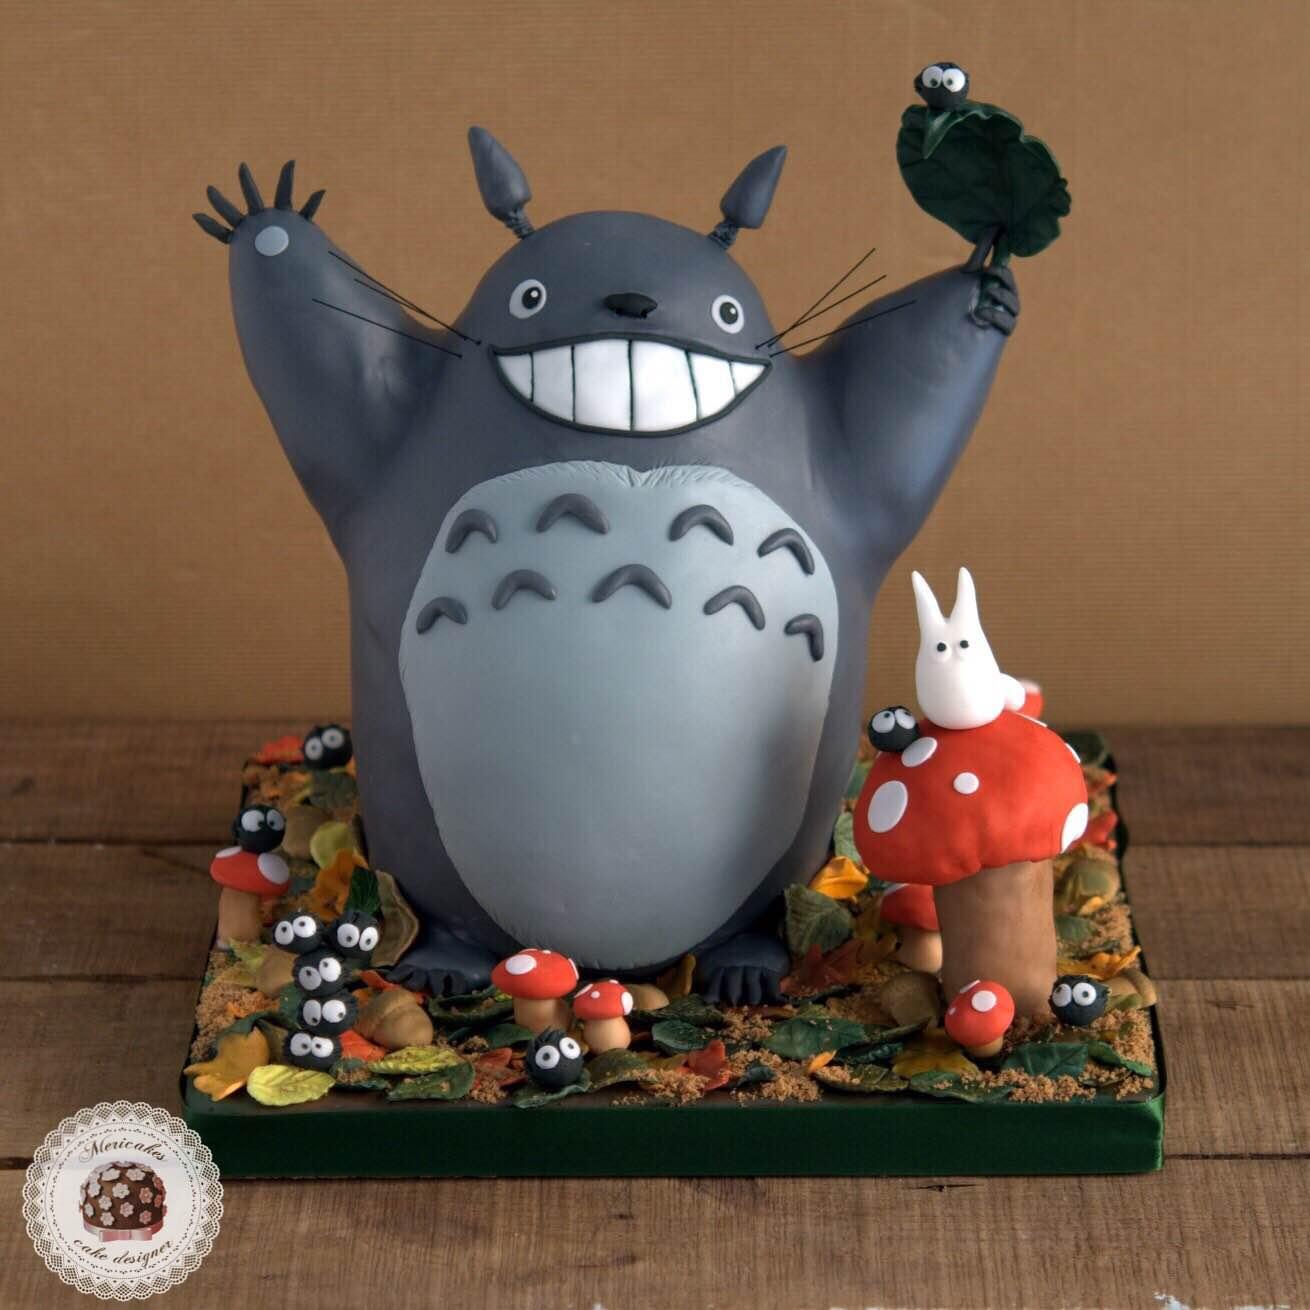 totoro-studio-ghibli-hayao-mizayaki-cake-tarta-3d-fondant-chocolate-barcelona-mericakes-8